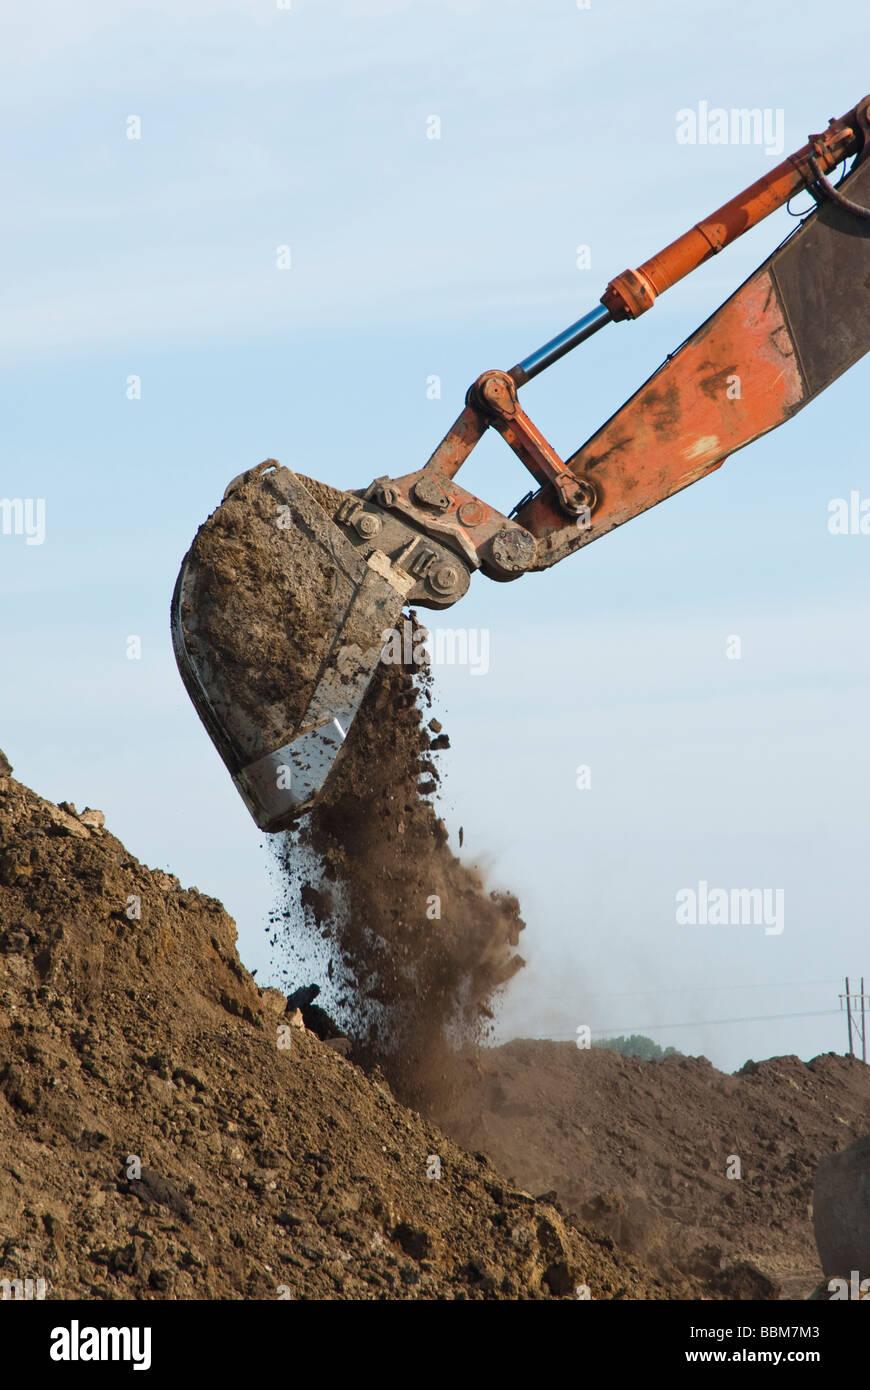 an excavator dumping a bucket of dirt - Stock Image